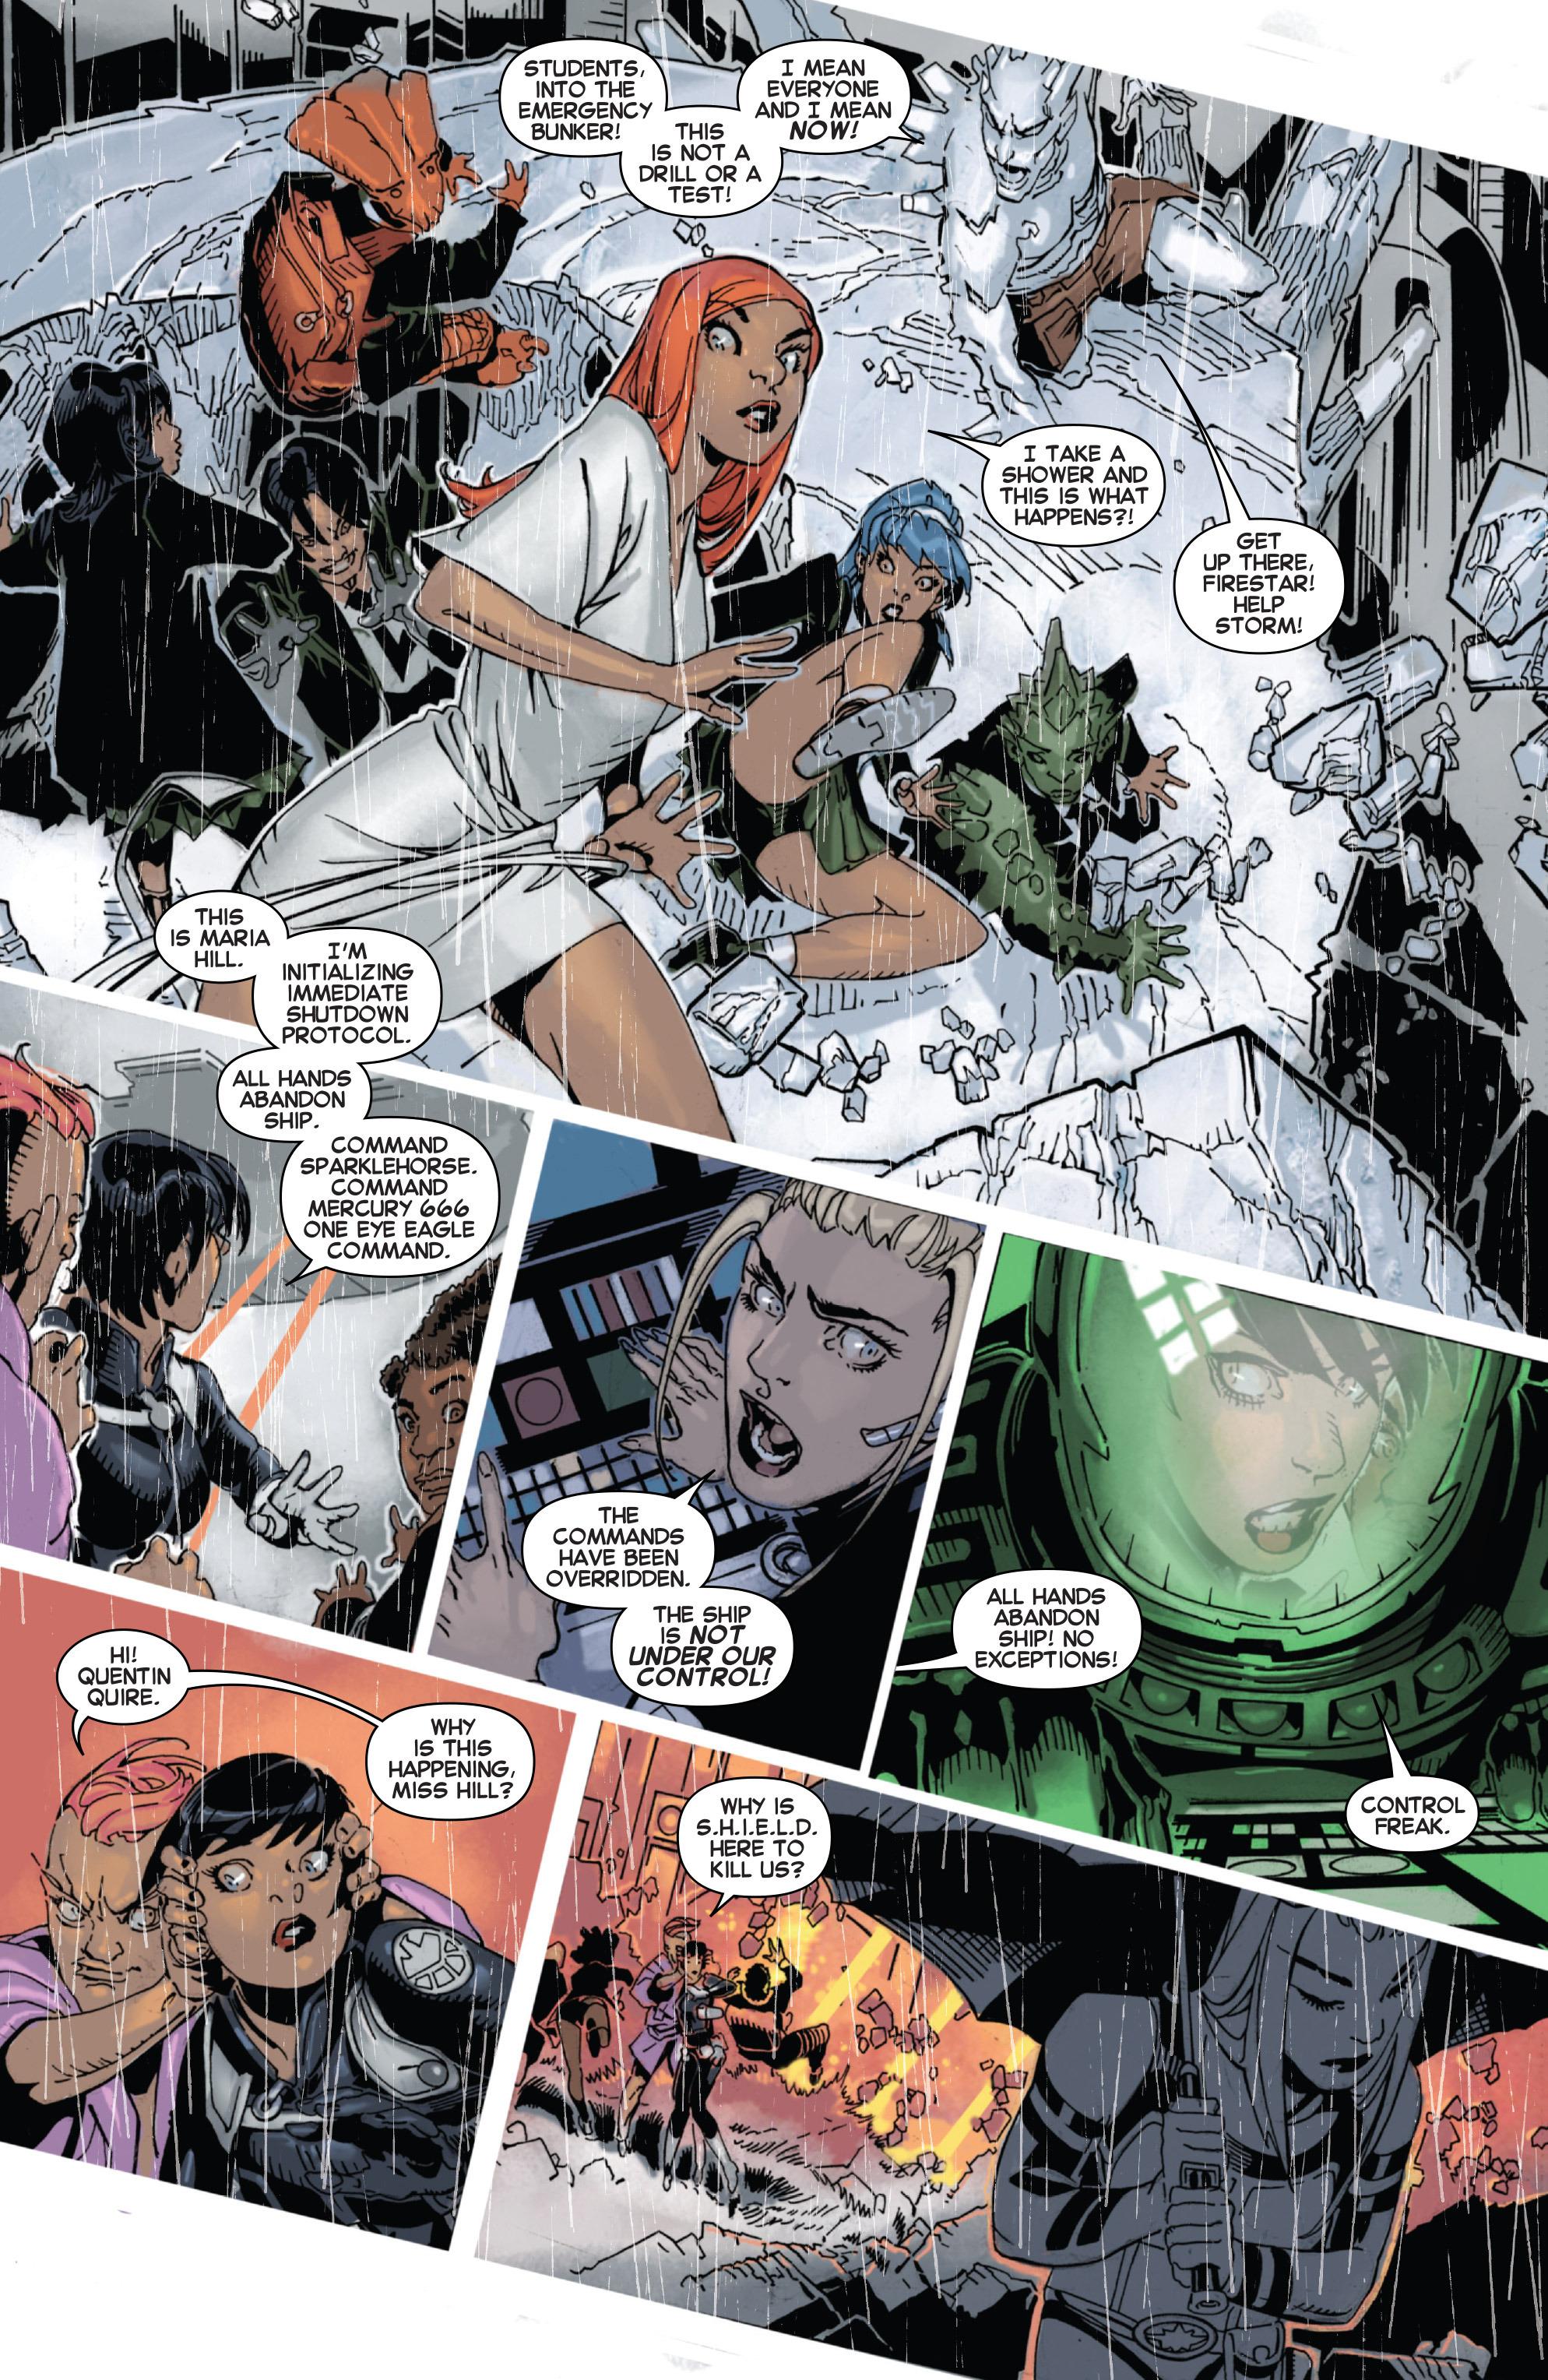 Read online Uncanny X-Men (2013) comic -  Issue # _TPB 4 - vs. S.H.I.E.L.D - 58